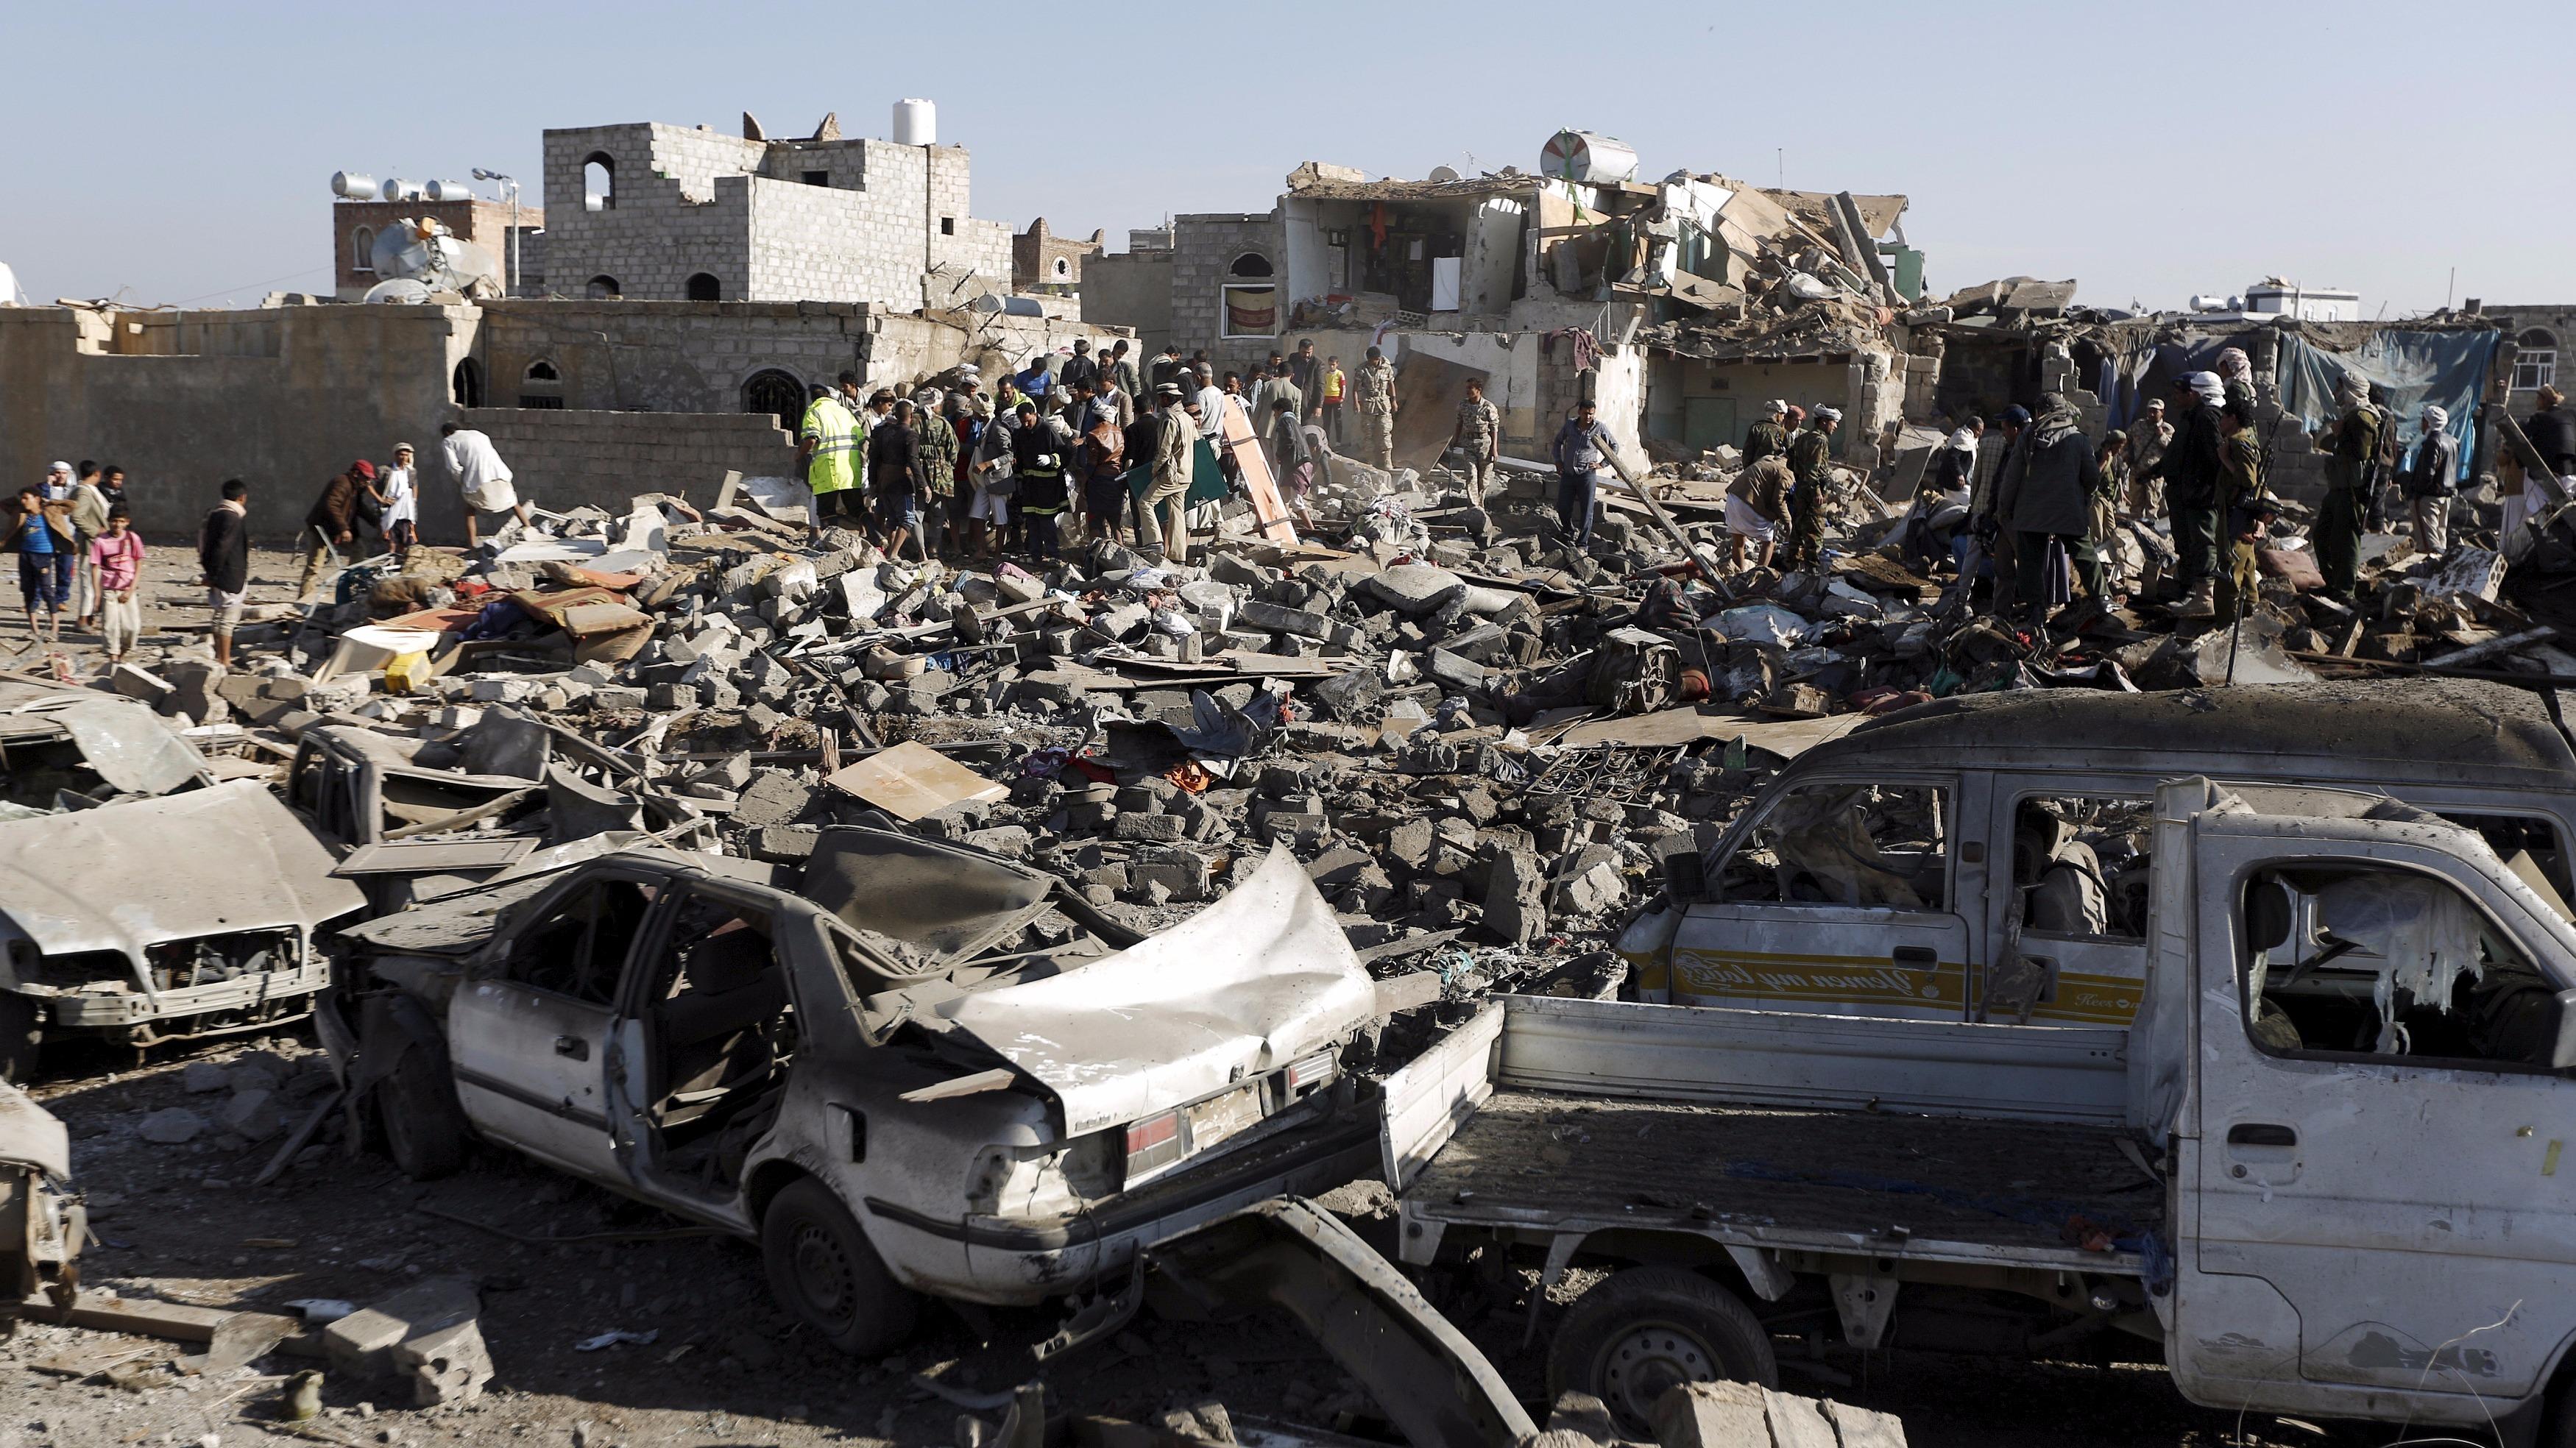 Civilians Killed in Saudi-led Air Strike, 3 Children Dead